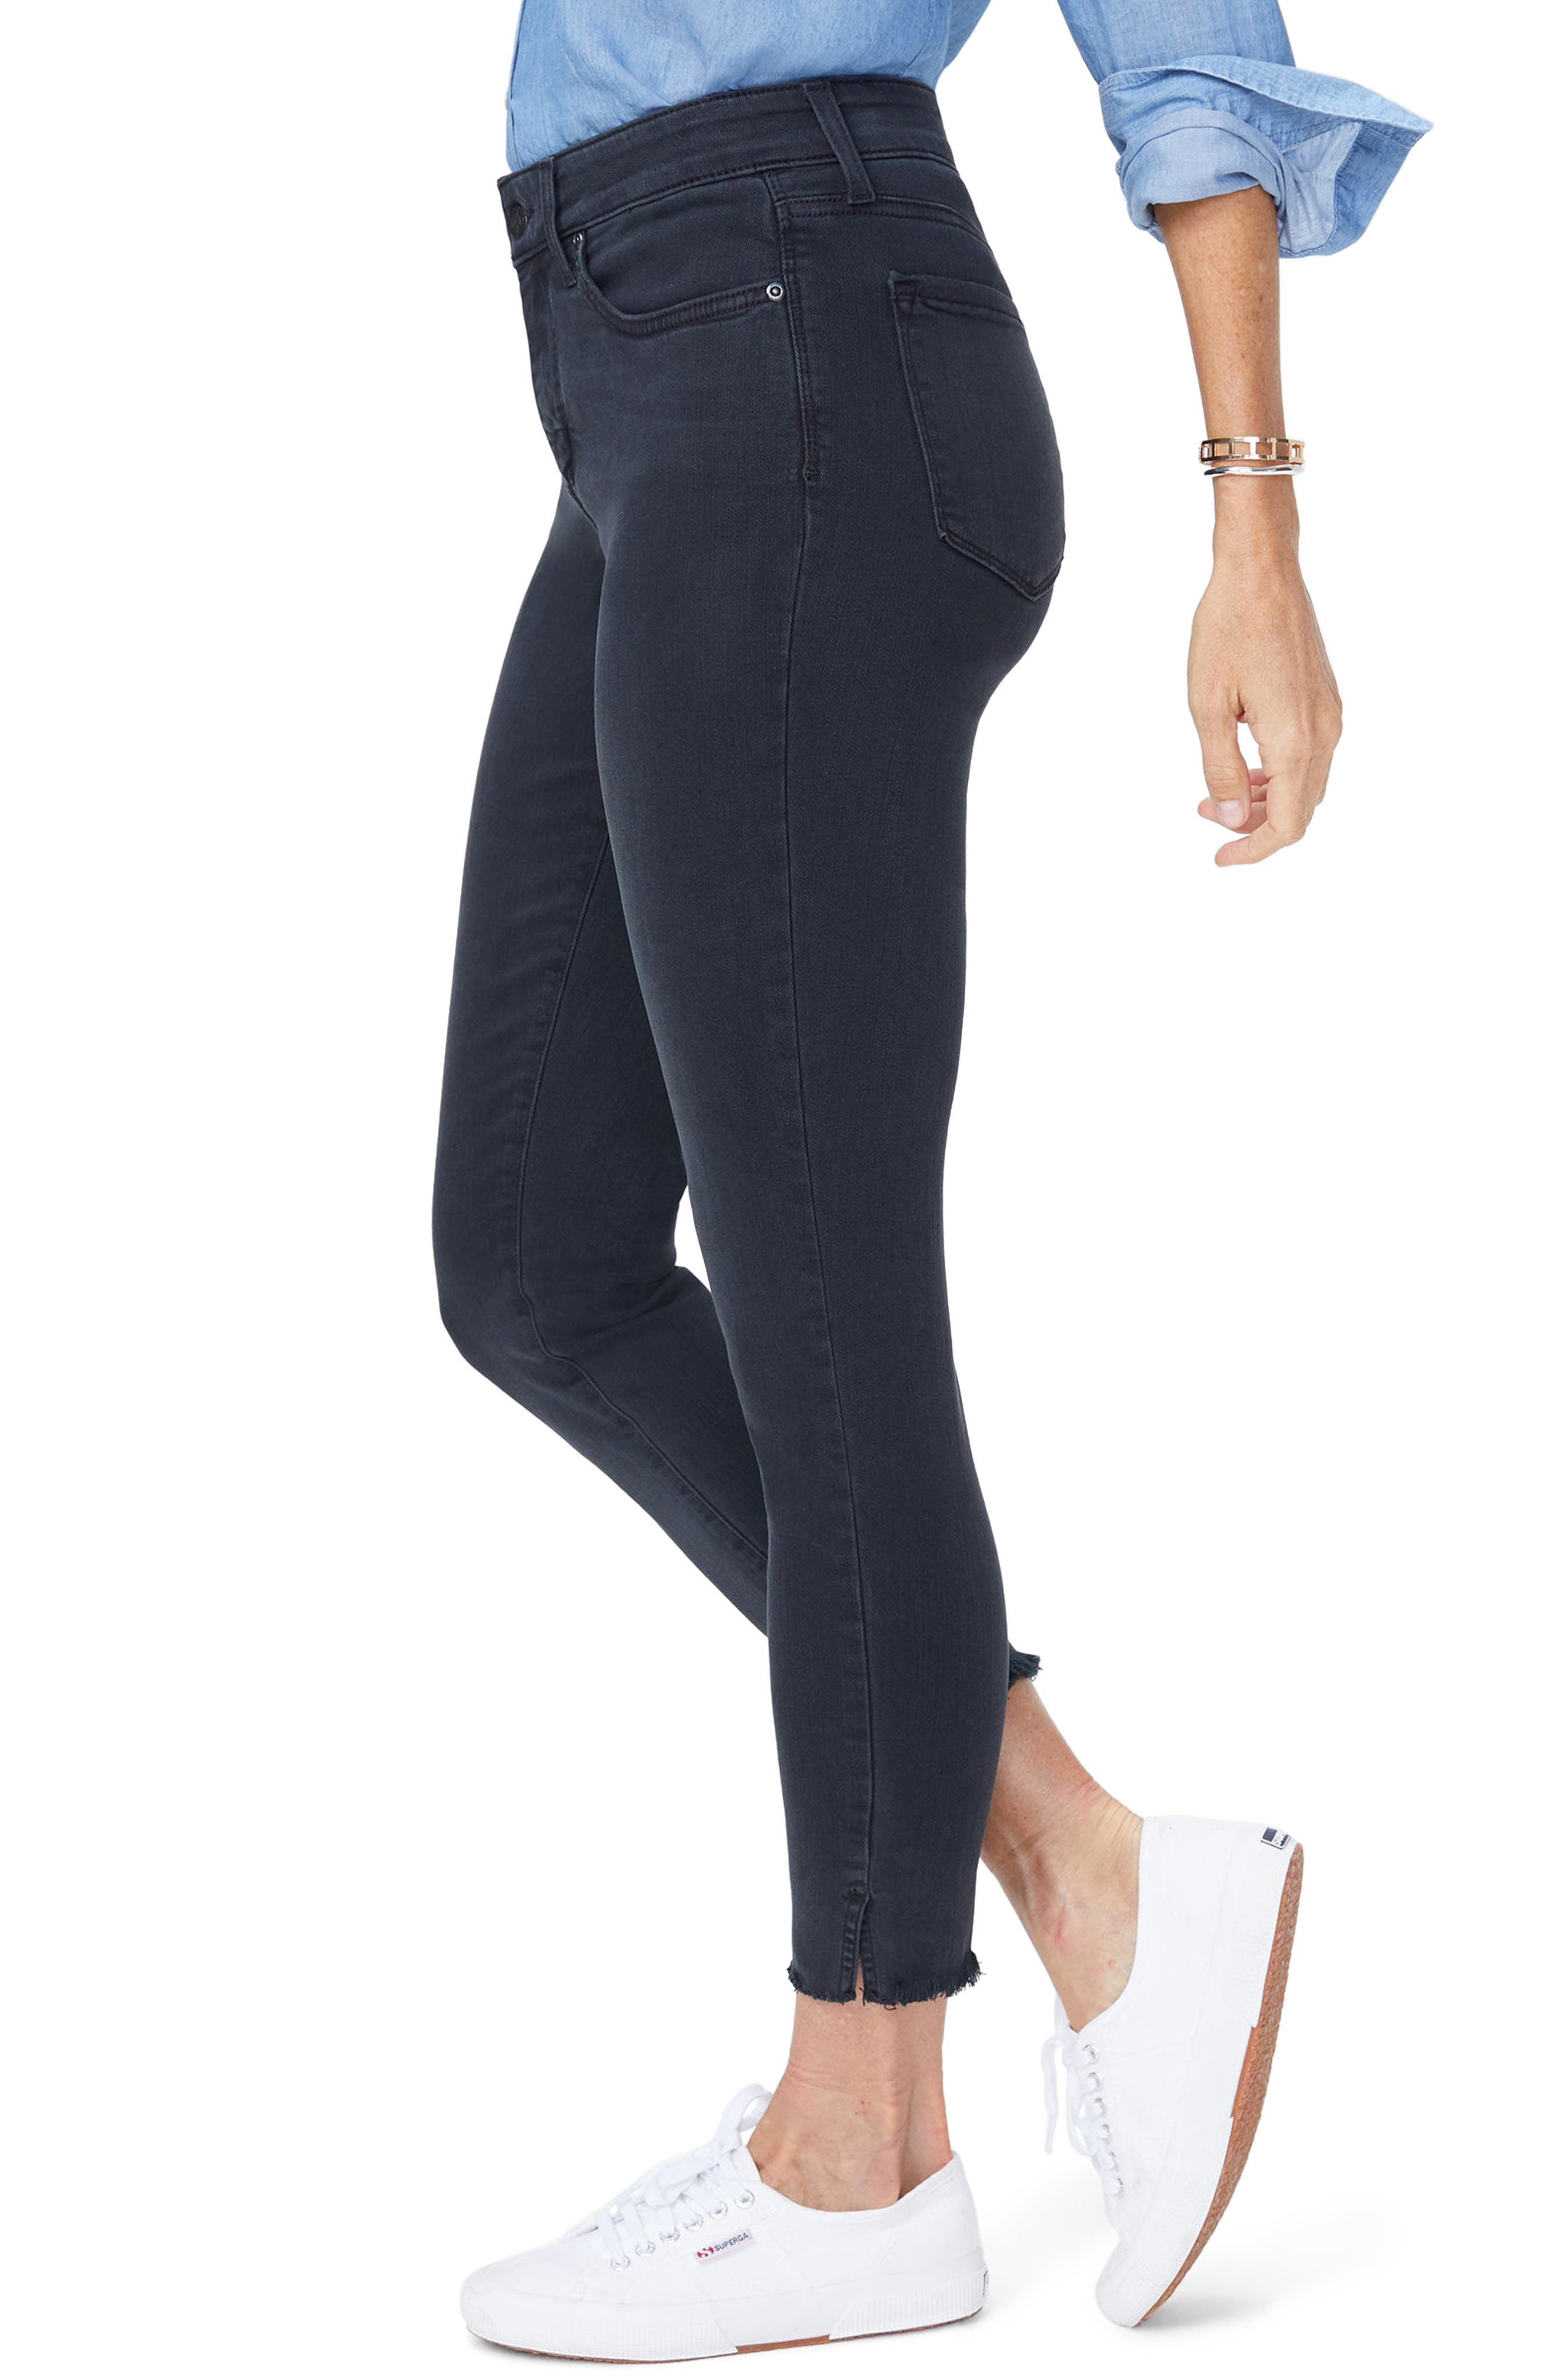 Ami Side Slit Fringe Hem Skinny Jeans,                             Alternate thumbnail 3, color,                             007